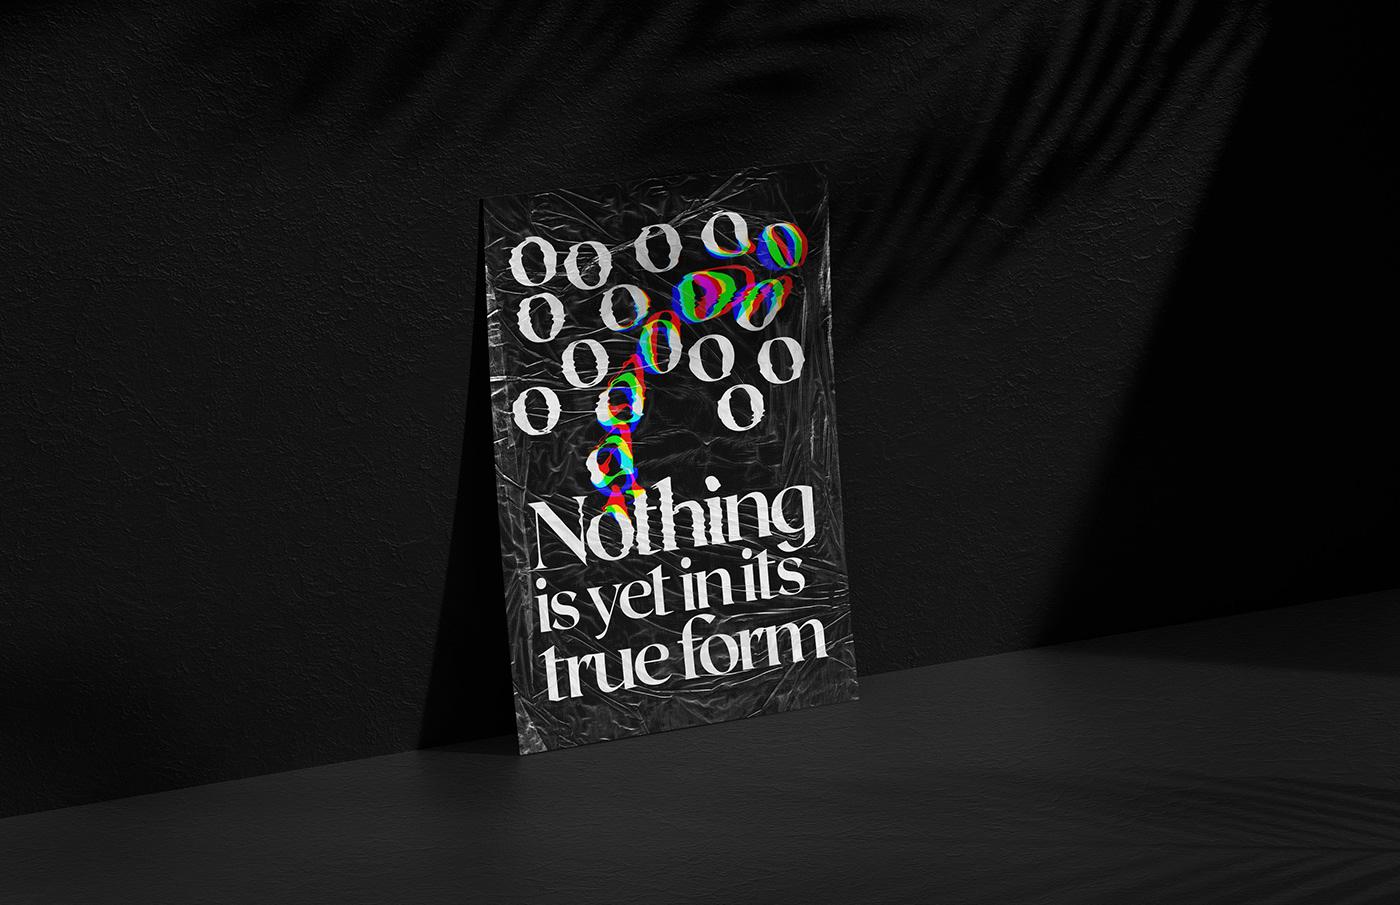 Glitch poster typhography Form generative glitch art nothing tipografia uruguay